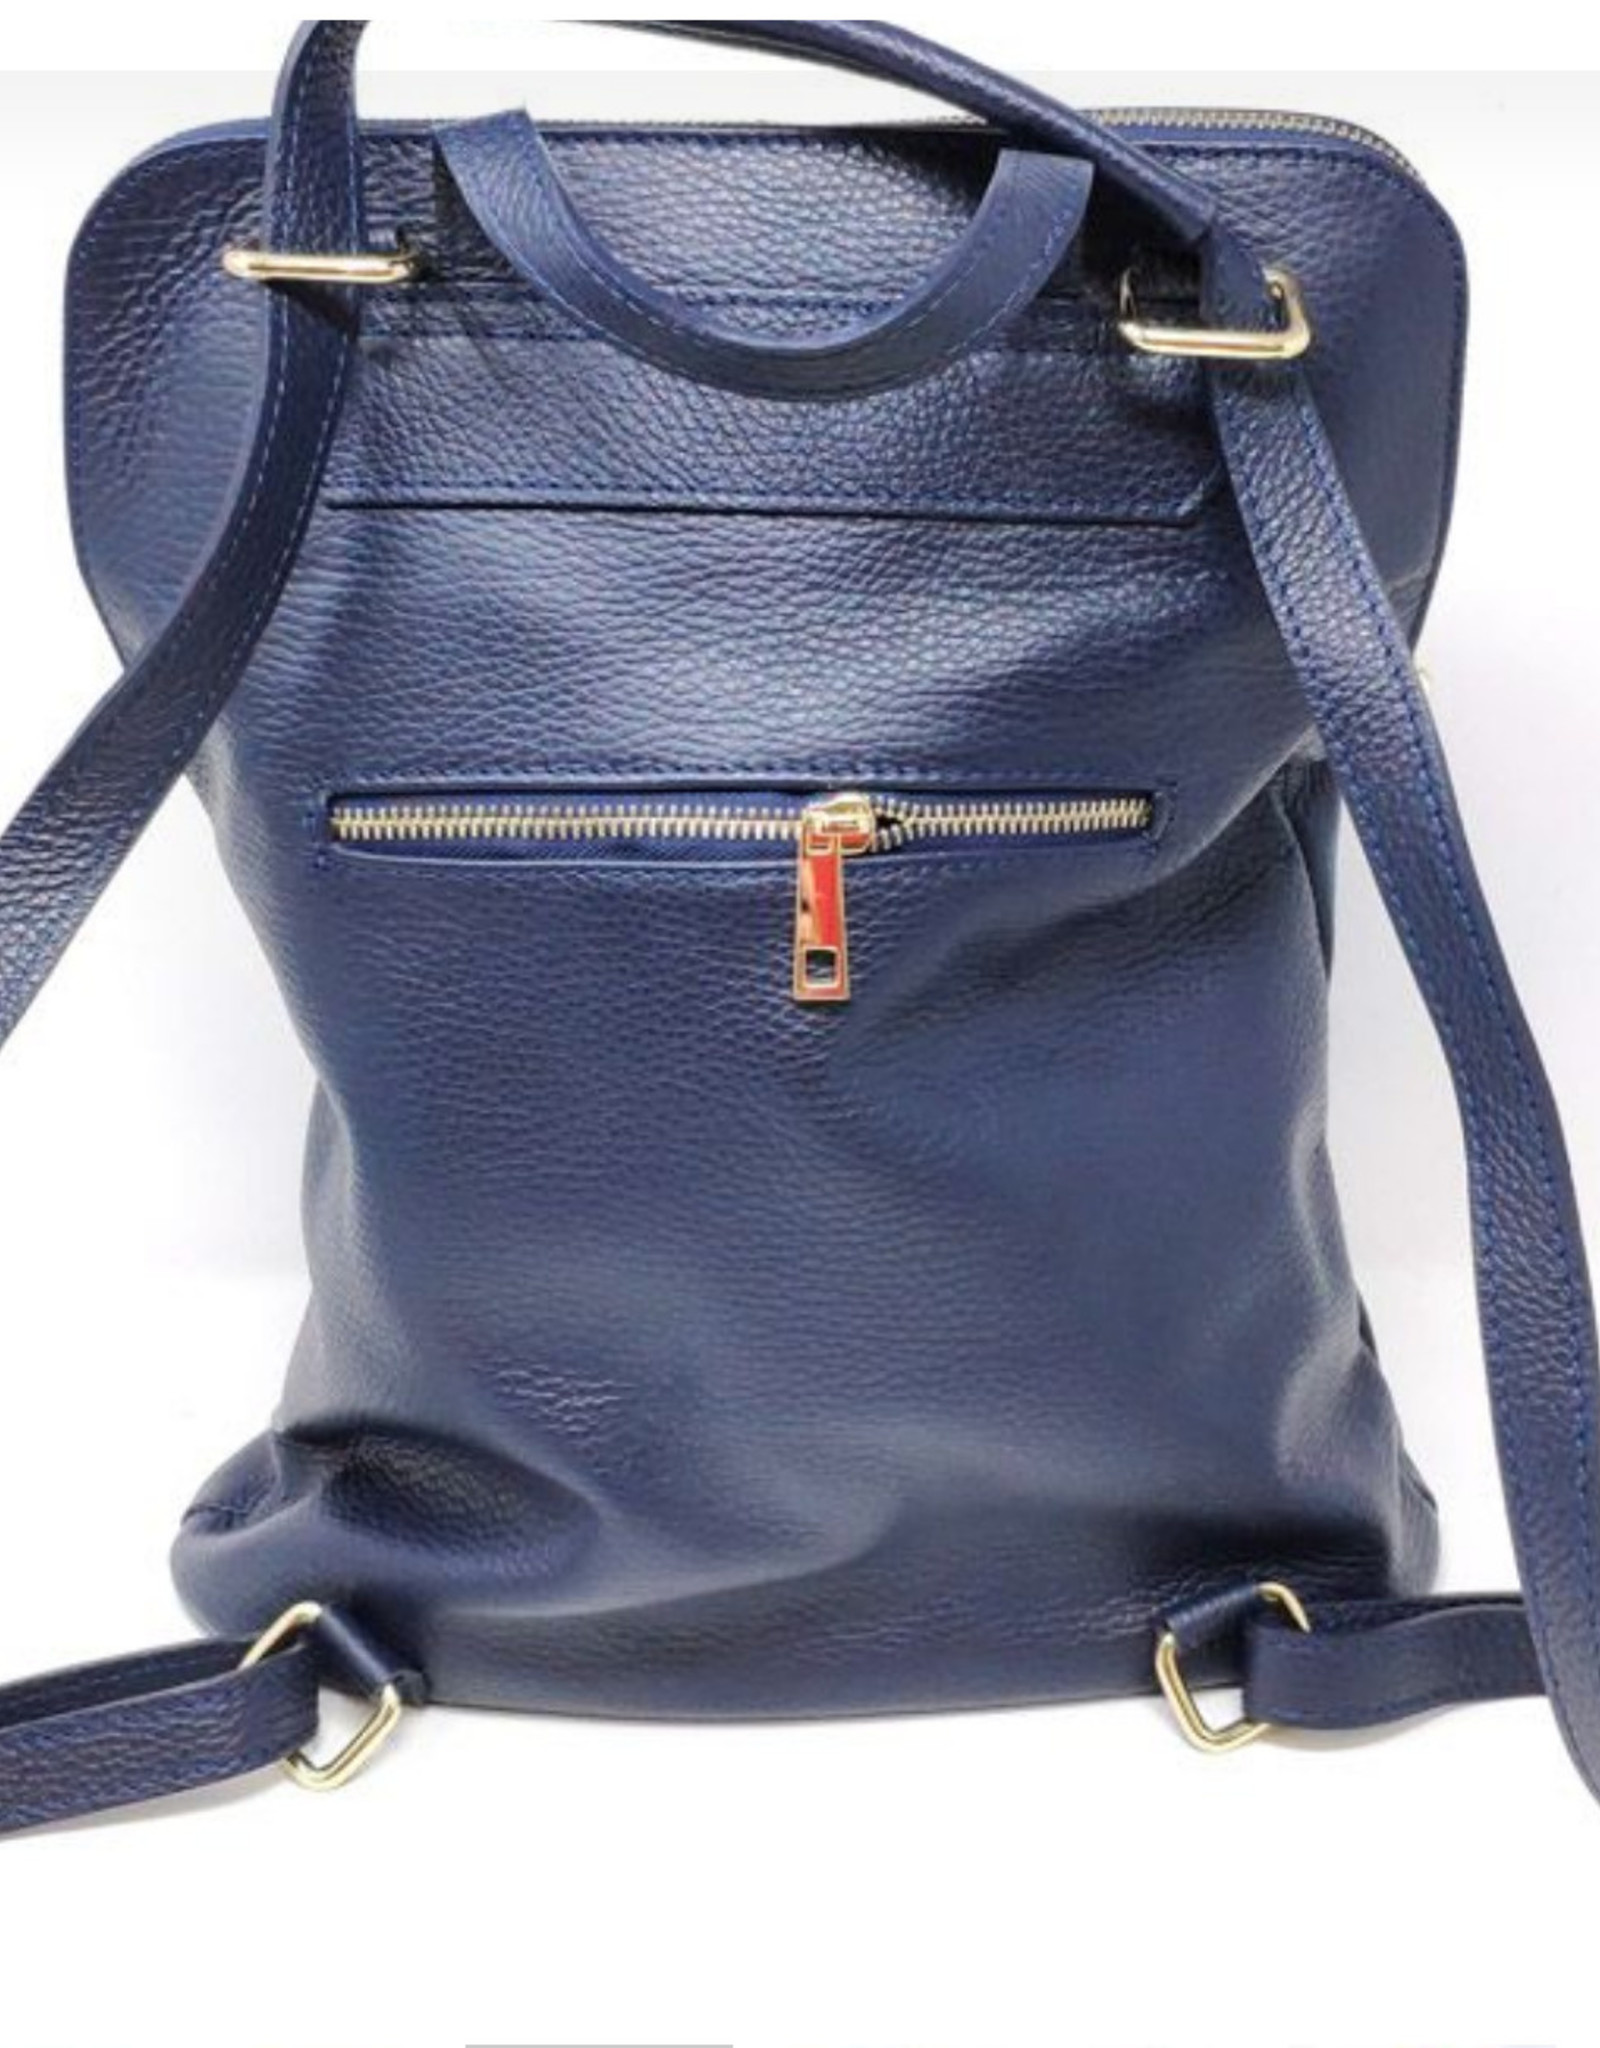 German Fuentes Italian Leather Borse in Pelle Purse